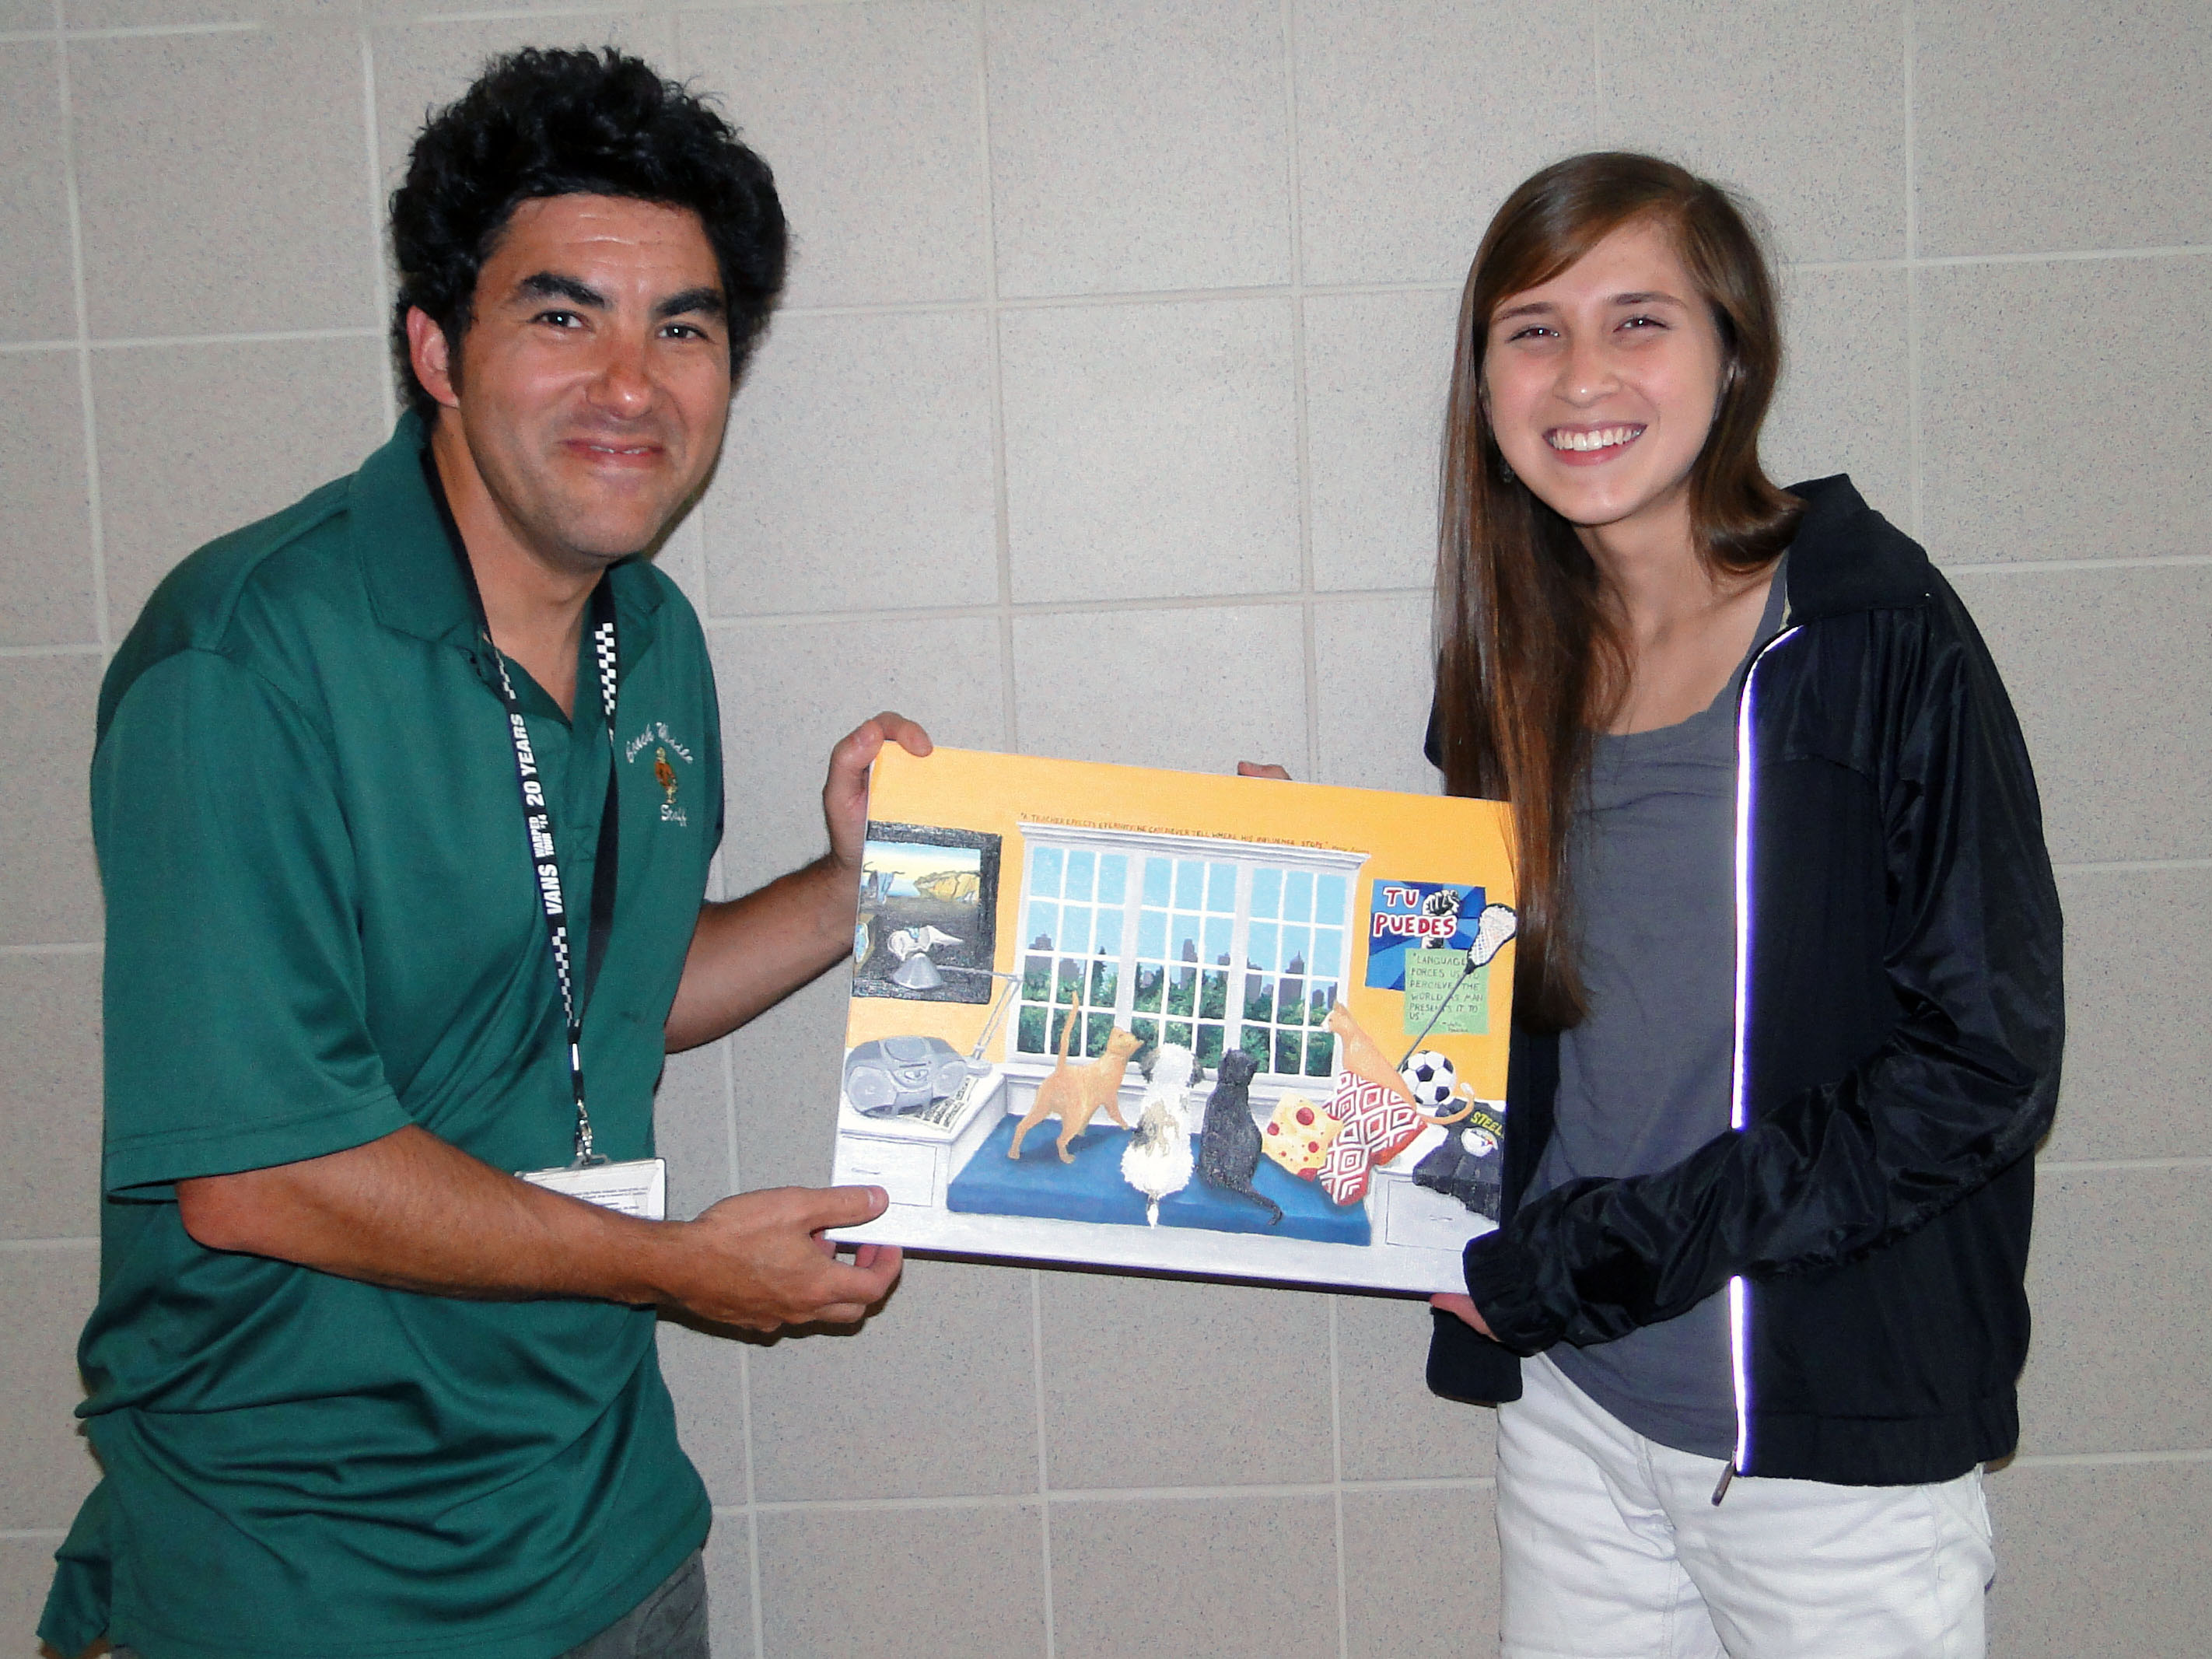 Valverde (right) dedicated her artwork to O'Neil.